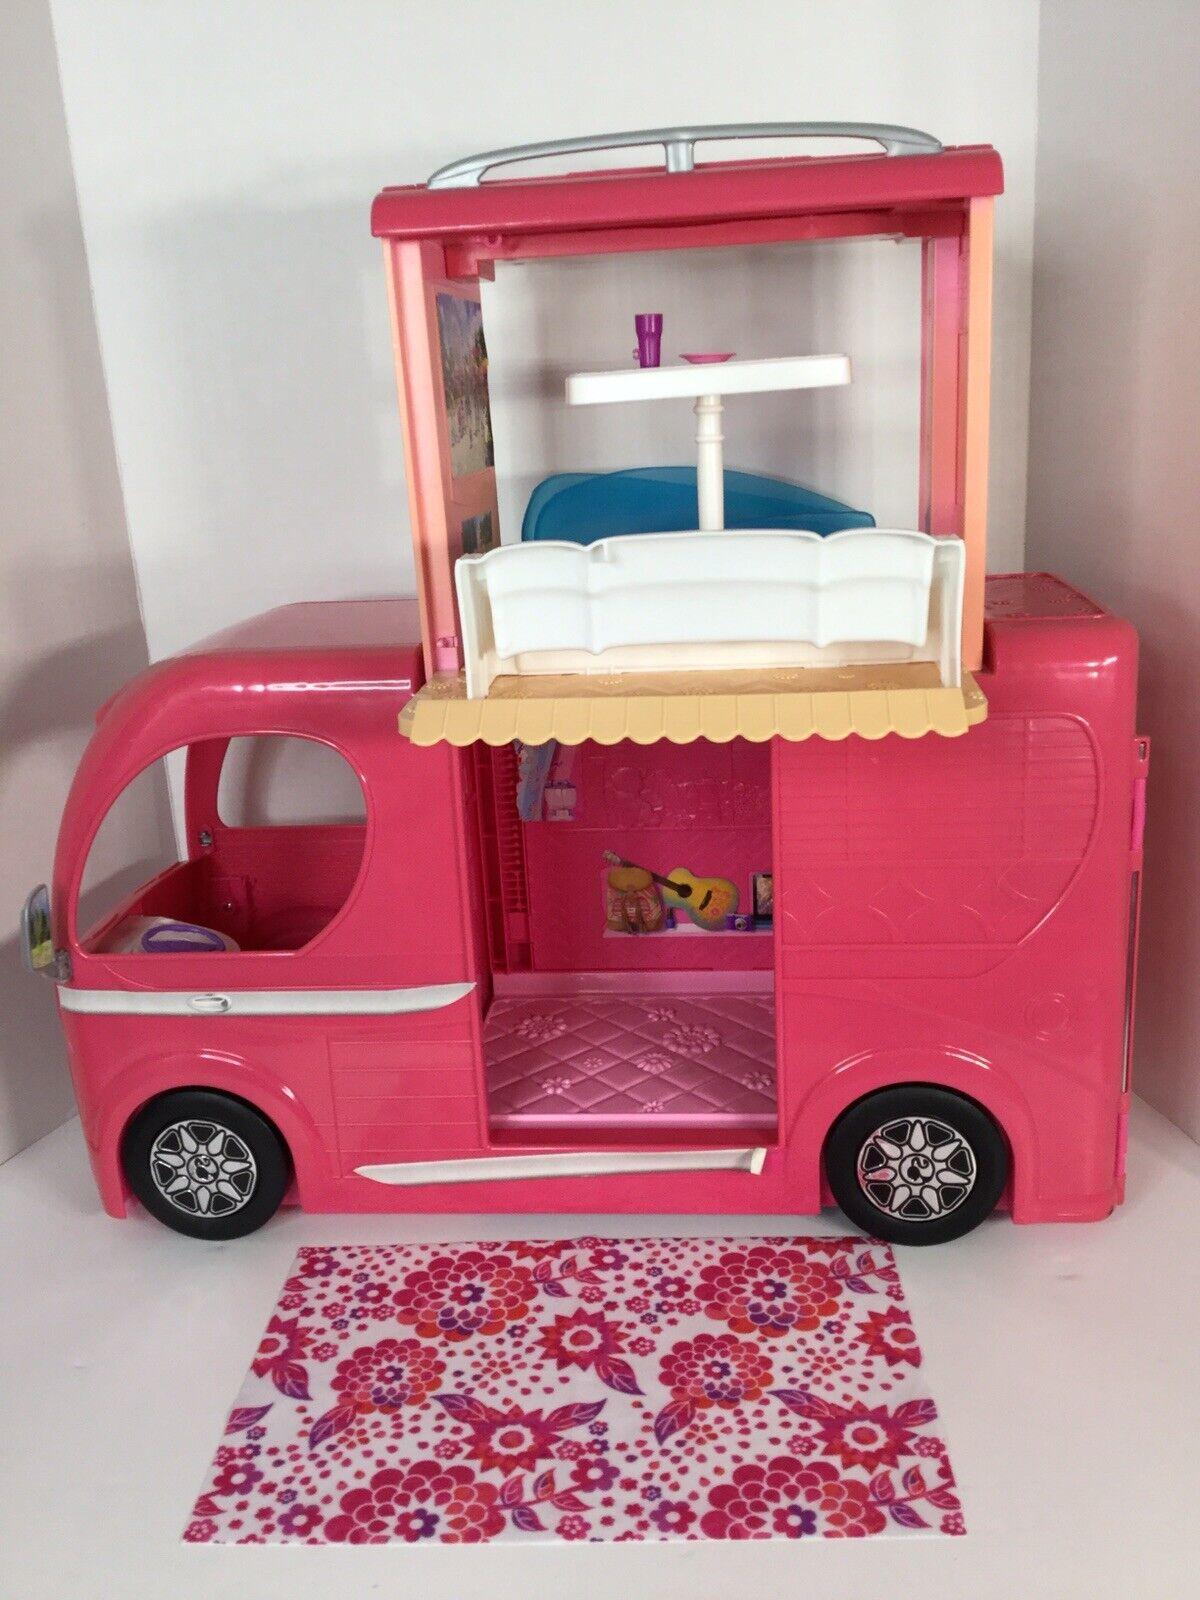 Mattel 2015 Barbie RV Pop-Up Camper